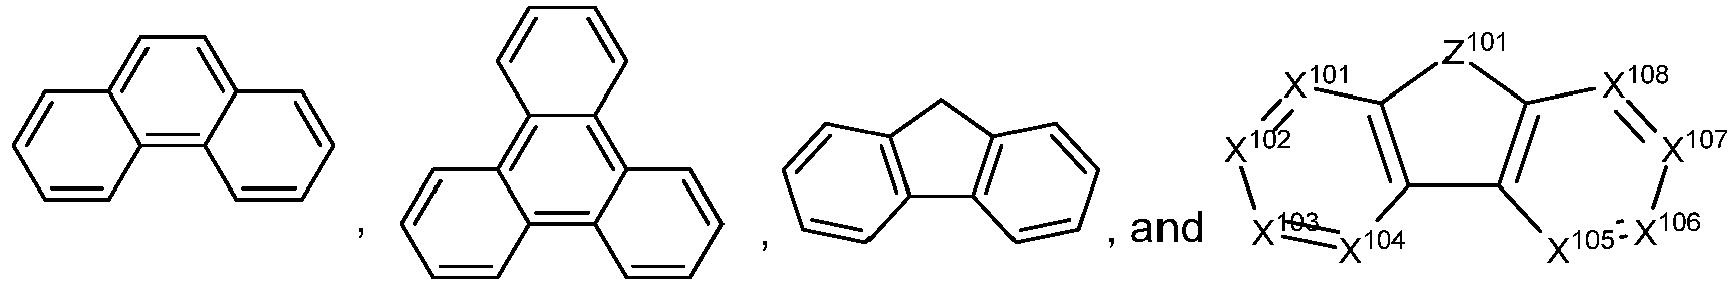 Figure imgb0840